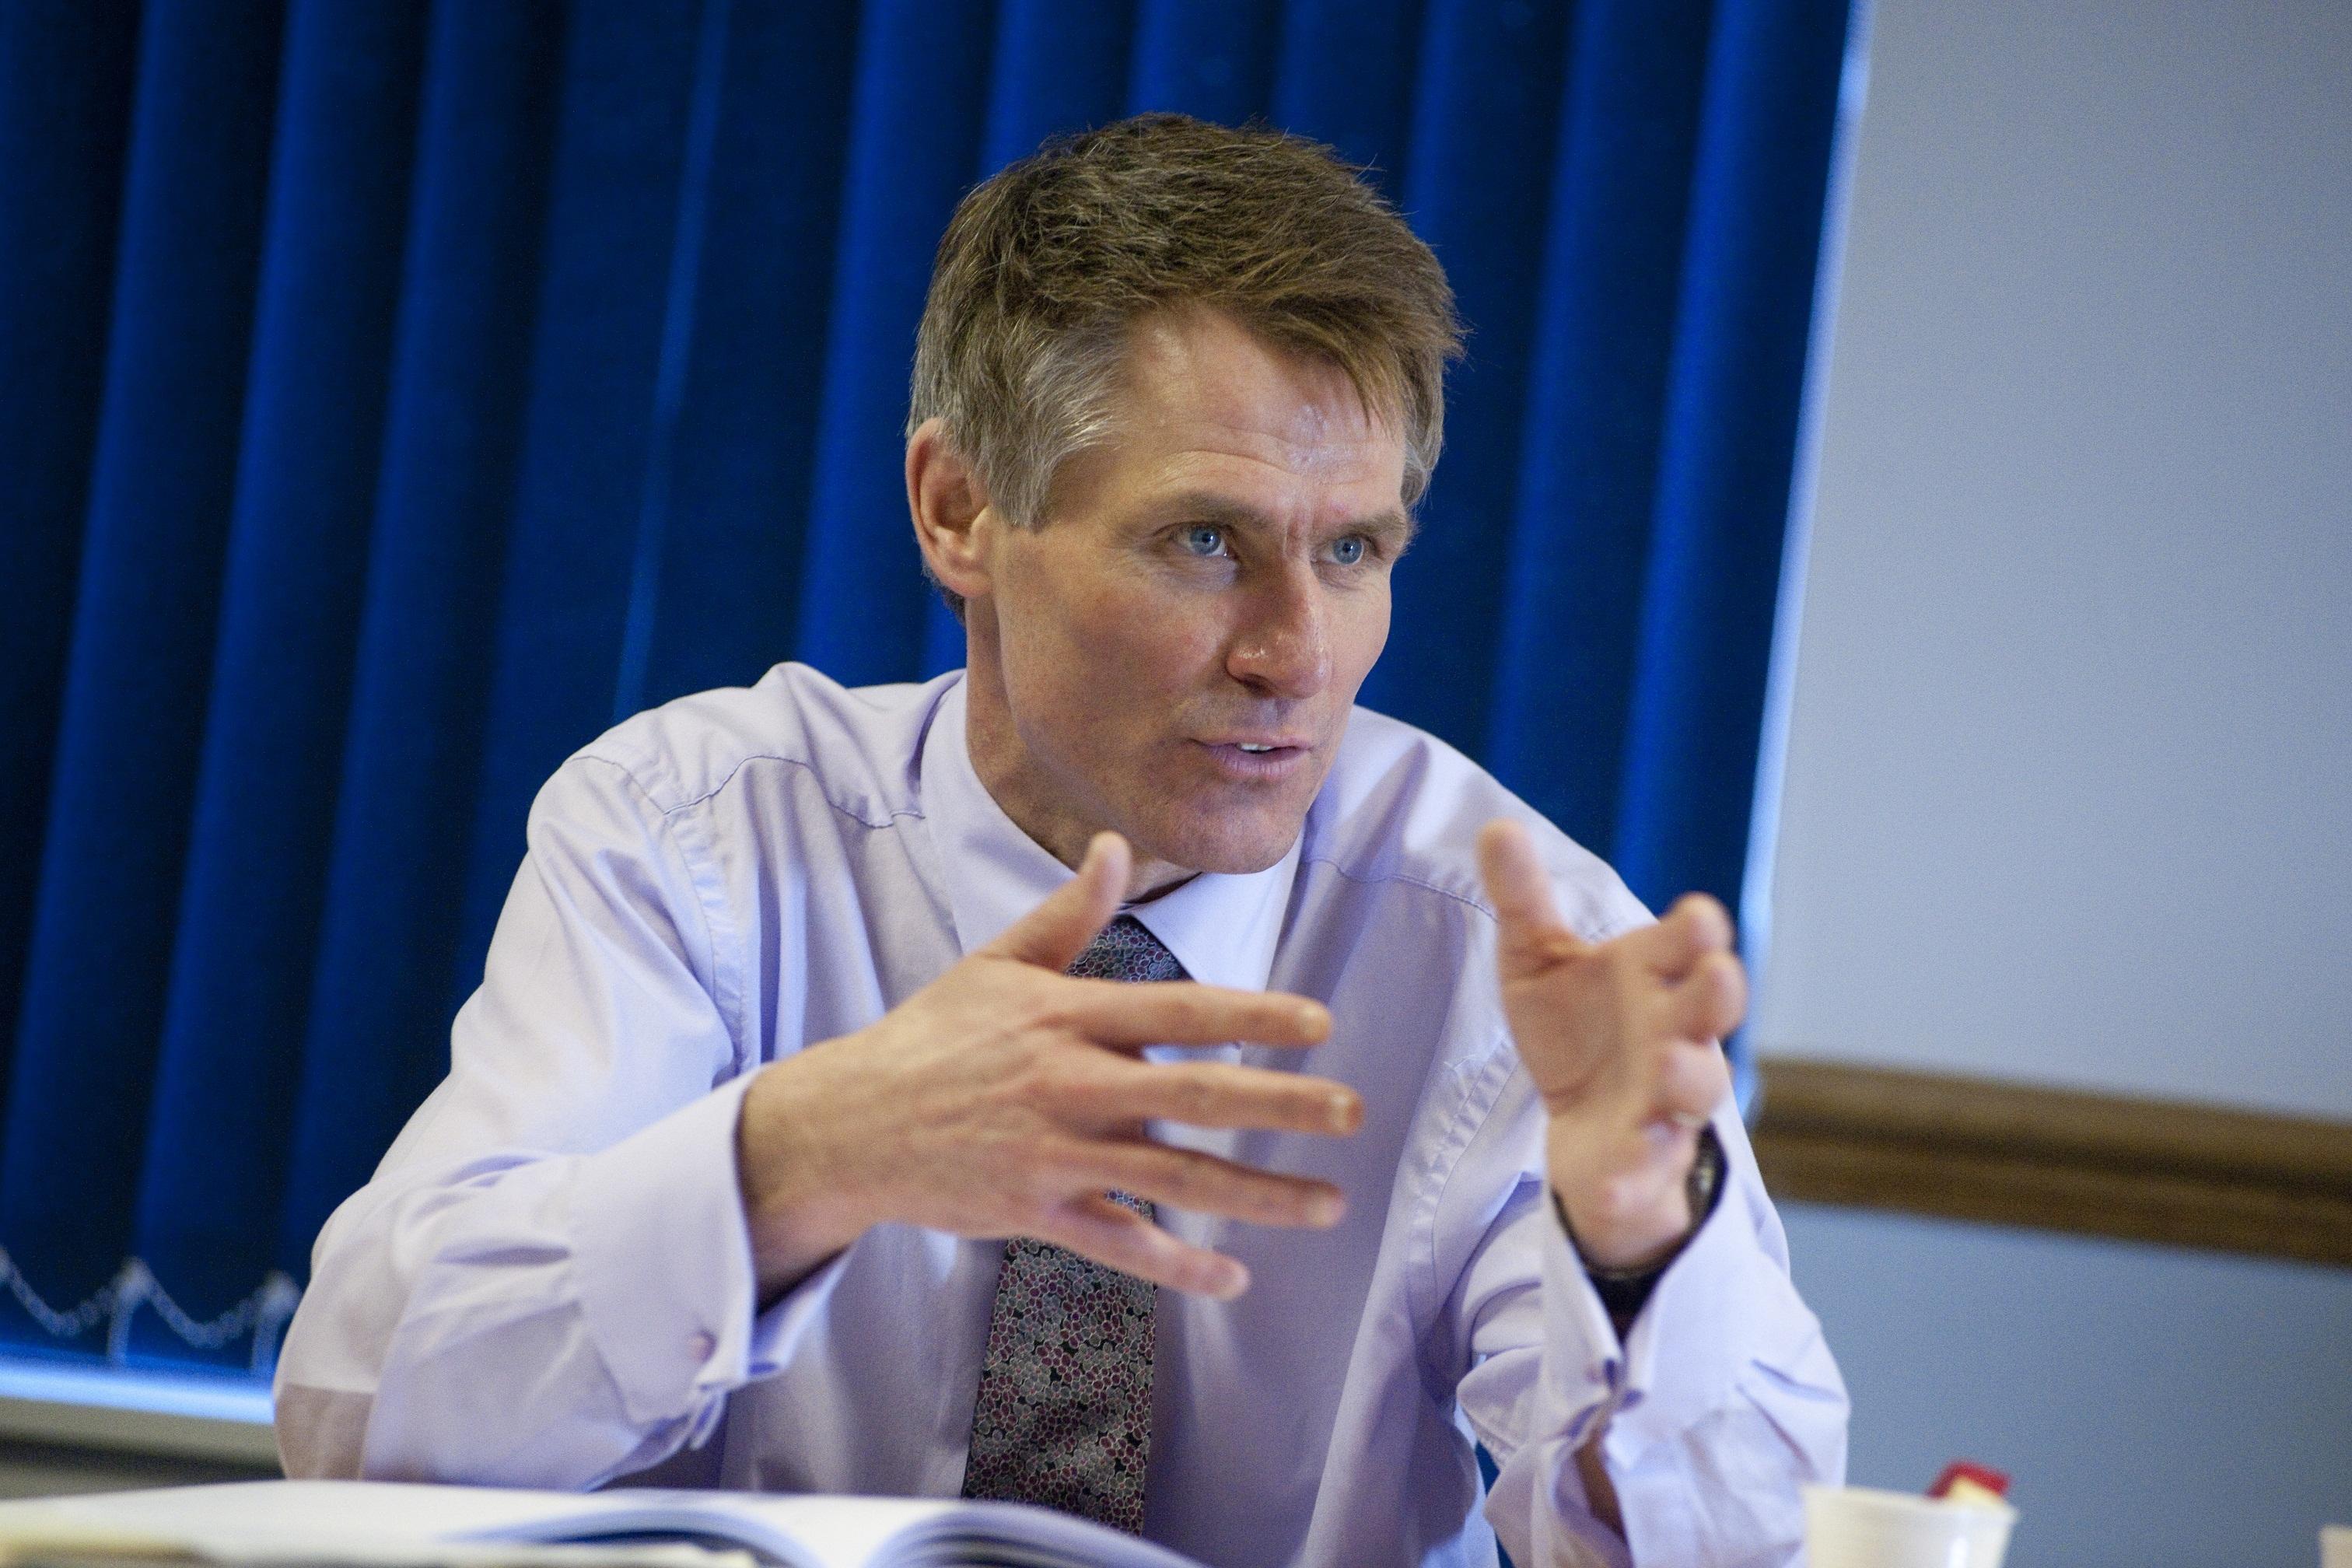 Mr Hall will spend two days a week working alongside civil servants